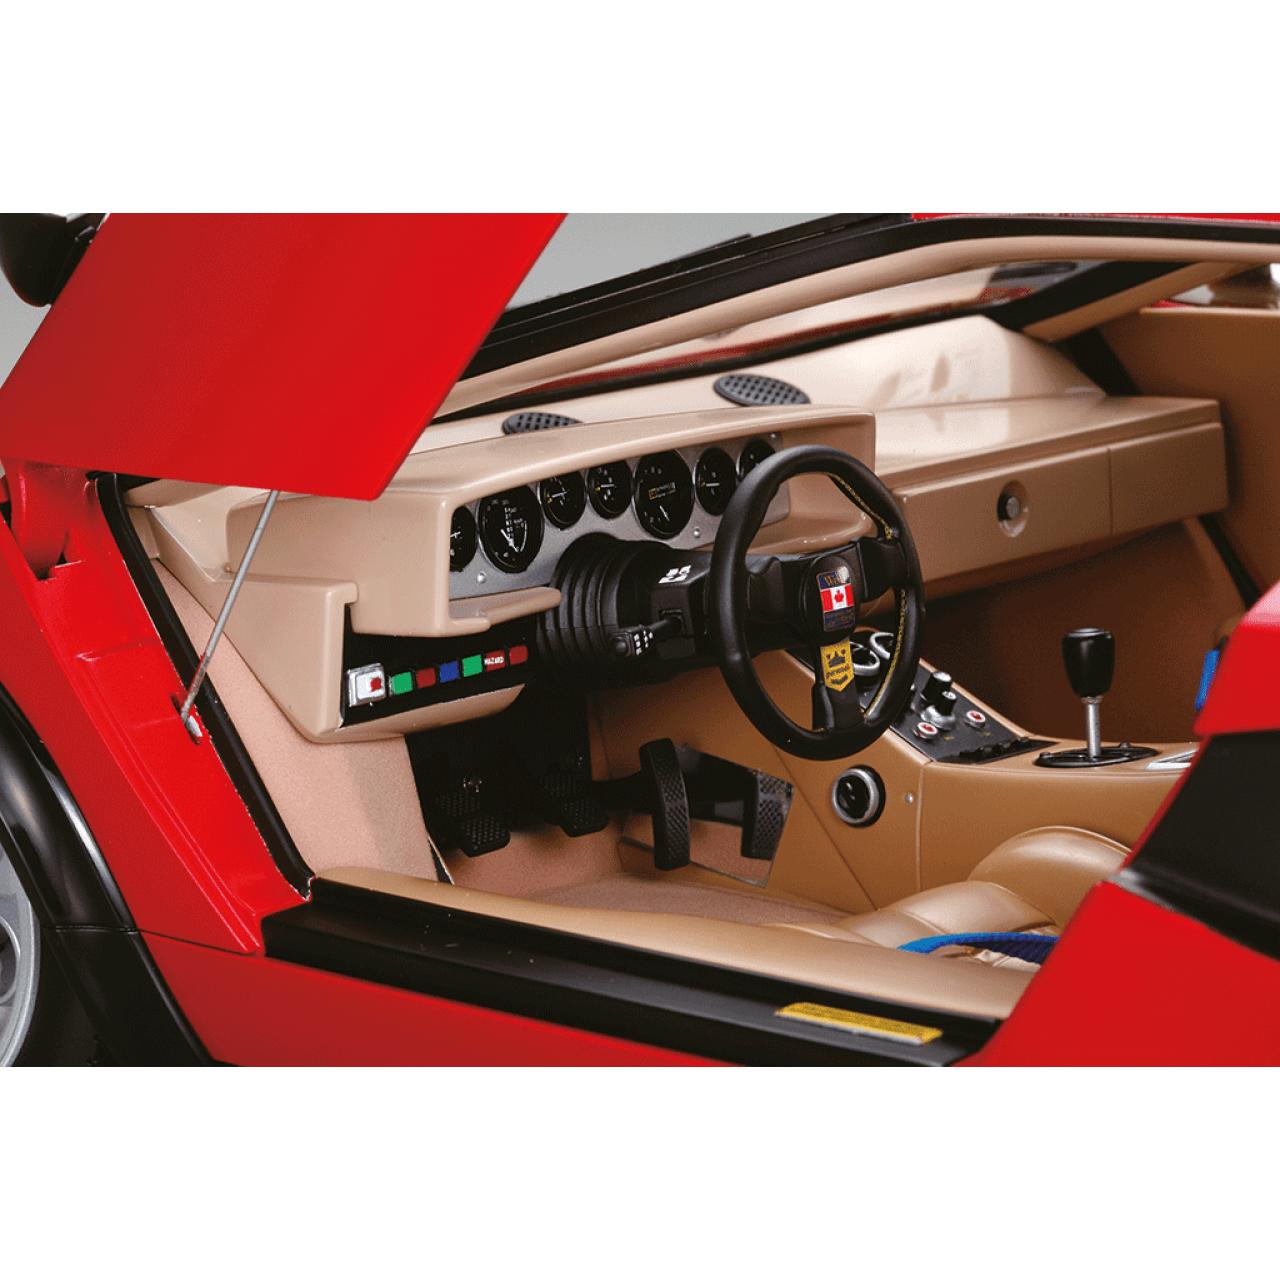 Lamborghini Countach Model Modelspace